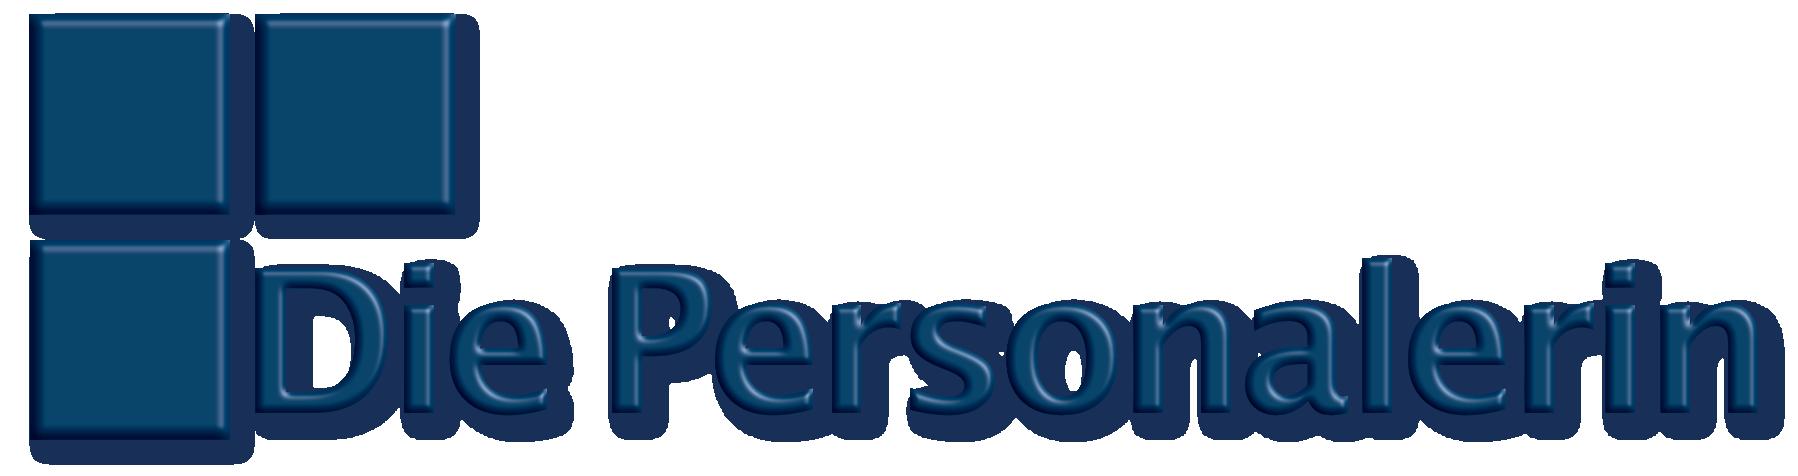 Zeitarbeit AÜG Equal Pay Schulungen Beratung Interim Management Organisationsberatung Kommunikation Bewerbermanagement Recruiting 4.0